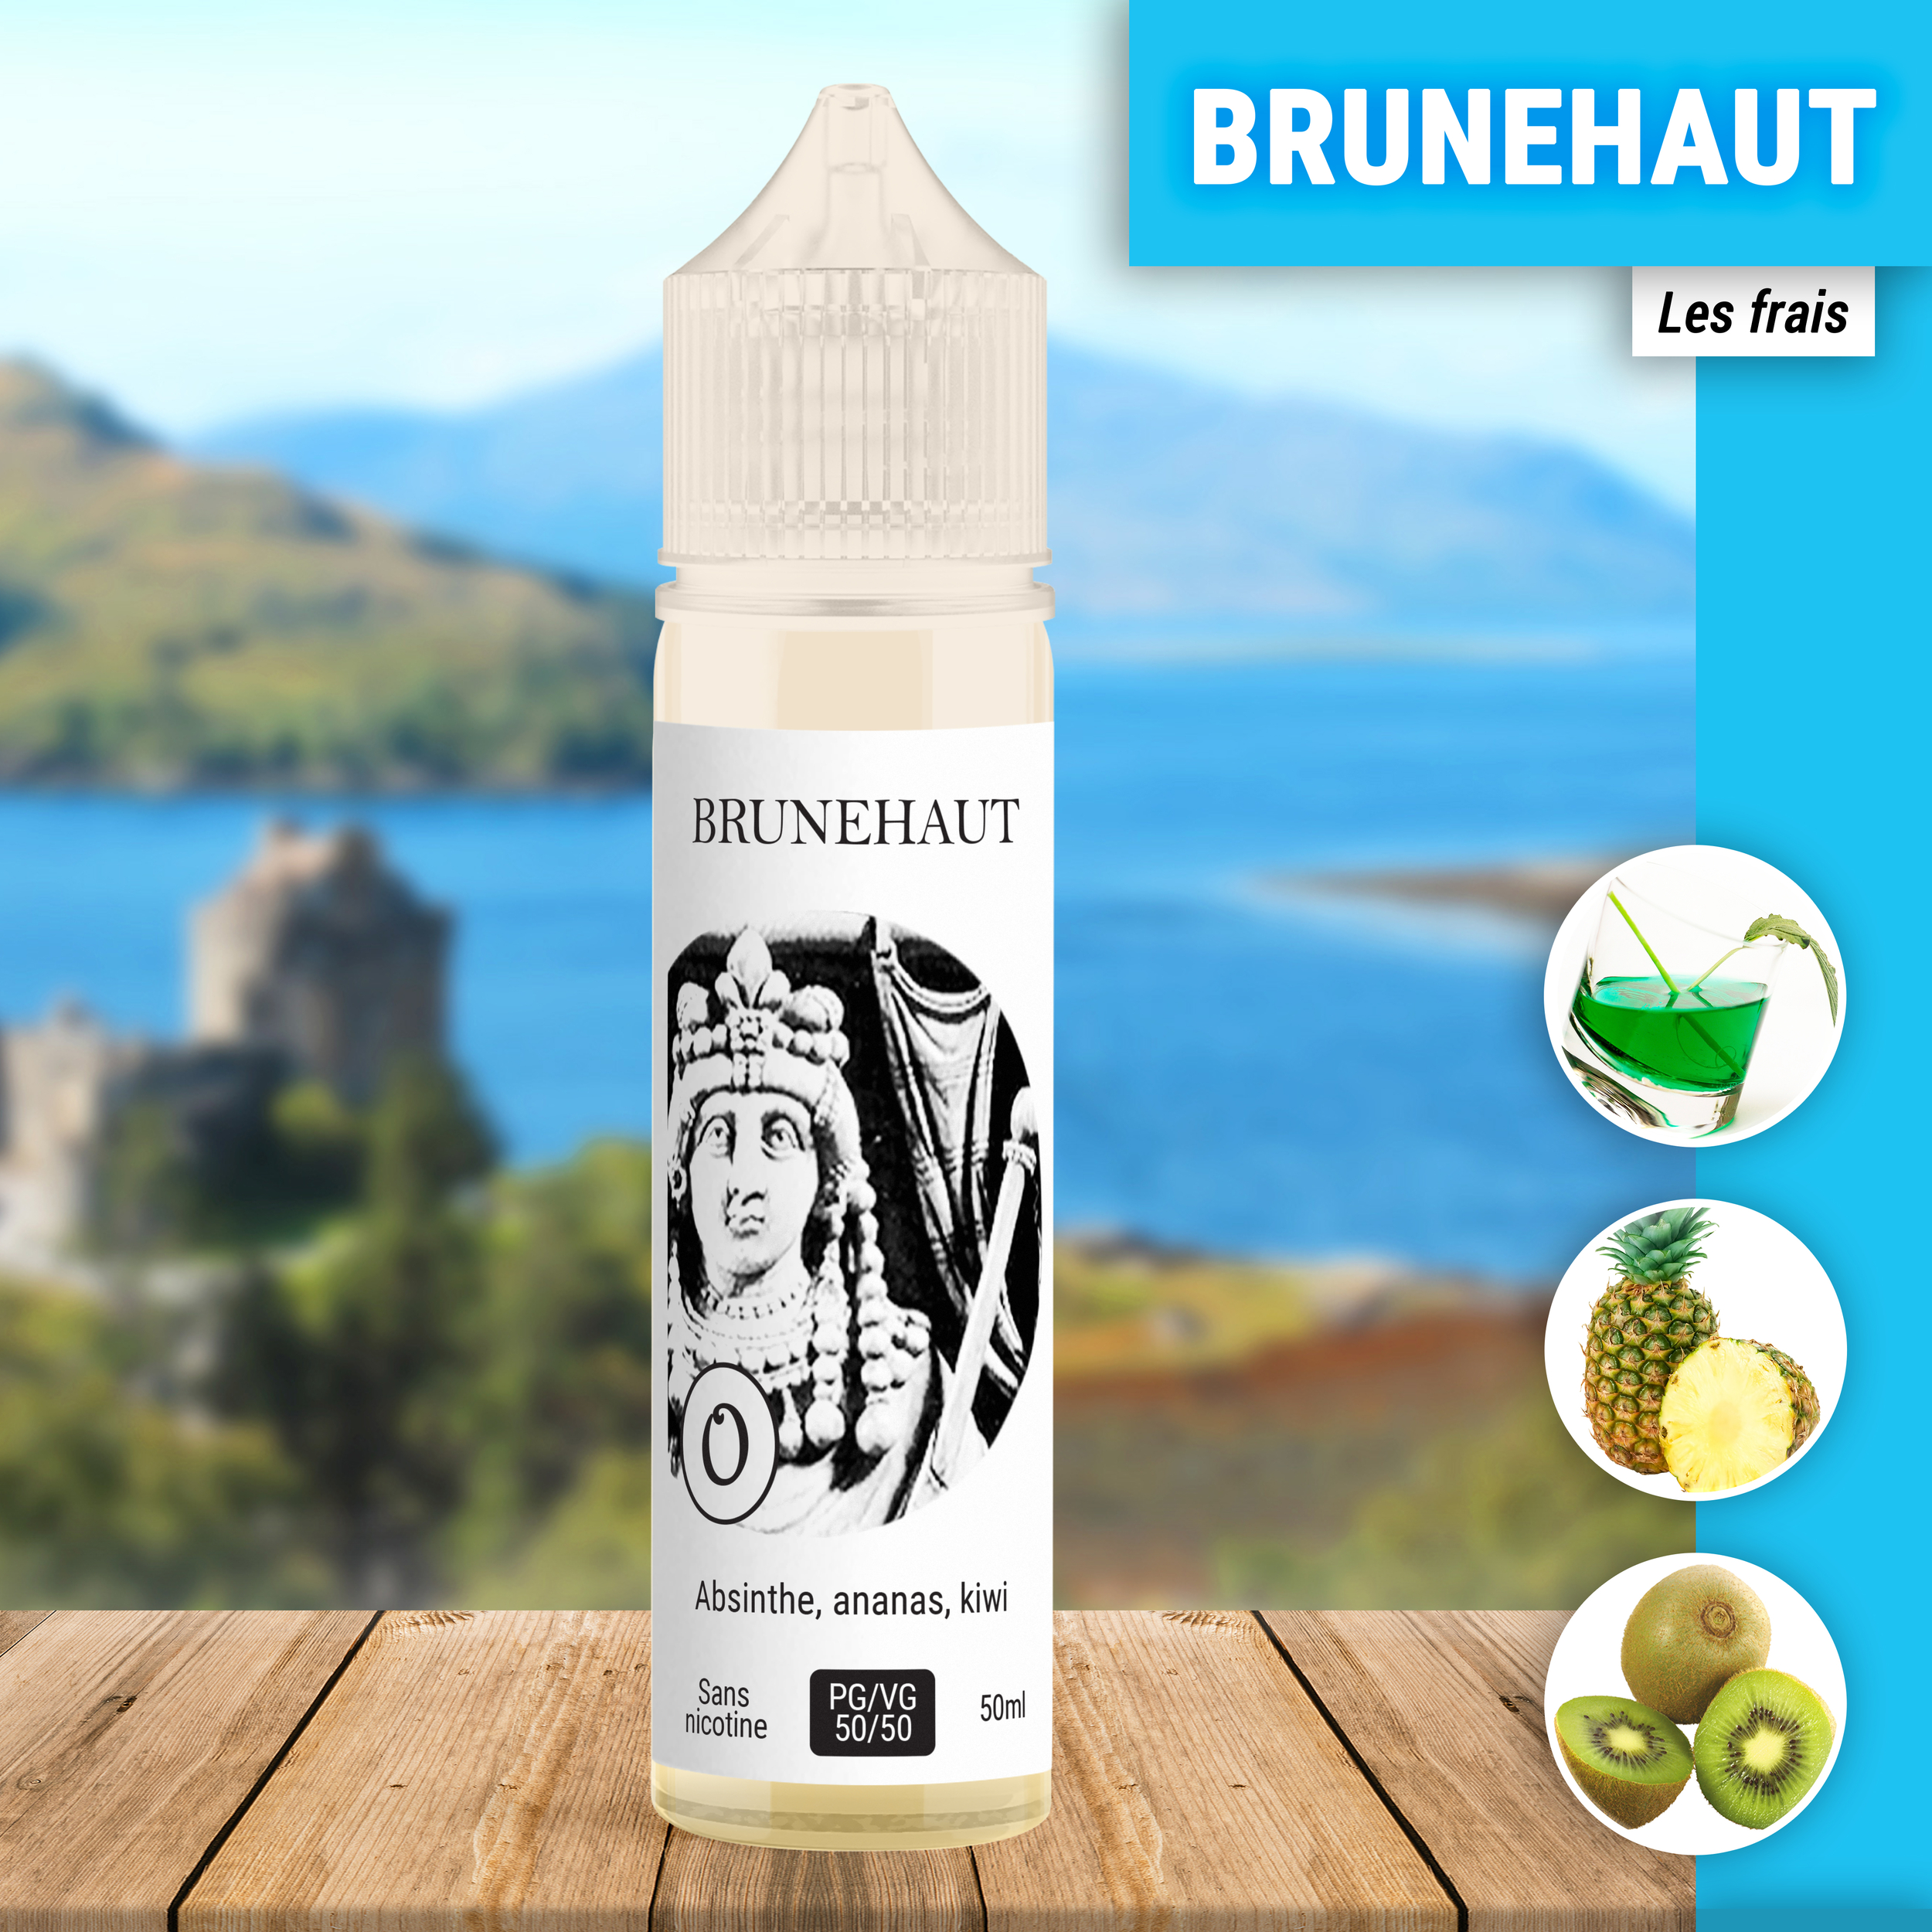 Brunehaut_Frais_PAB_Packshot_HD